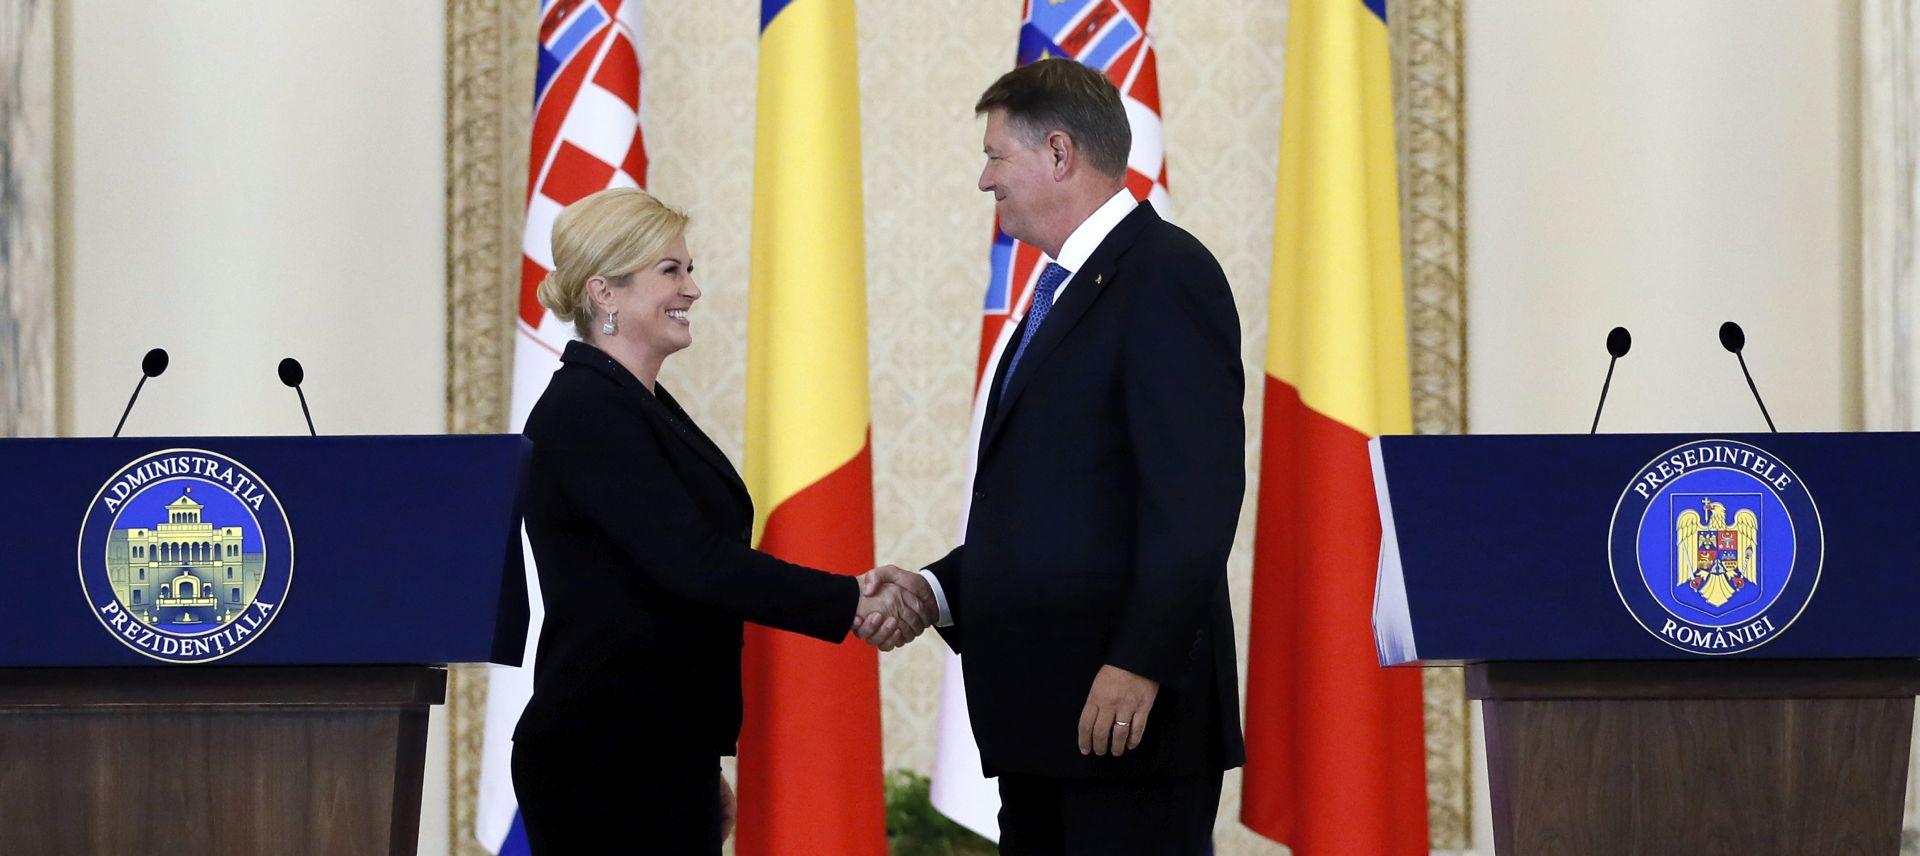 Grabar-Kitarović i Iohannis: 'Veliki potencijal gospodarske suradnje nedovoljno iskorišten'